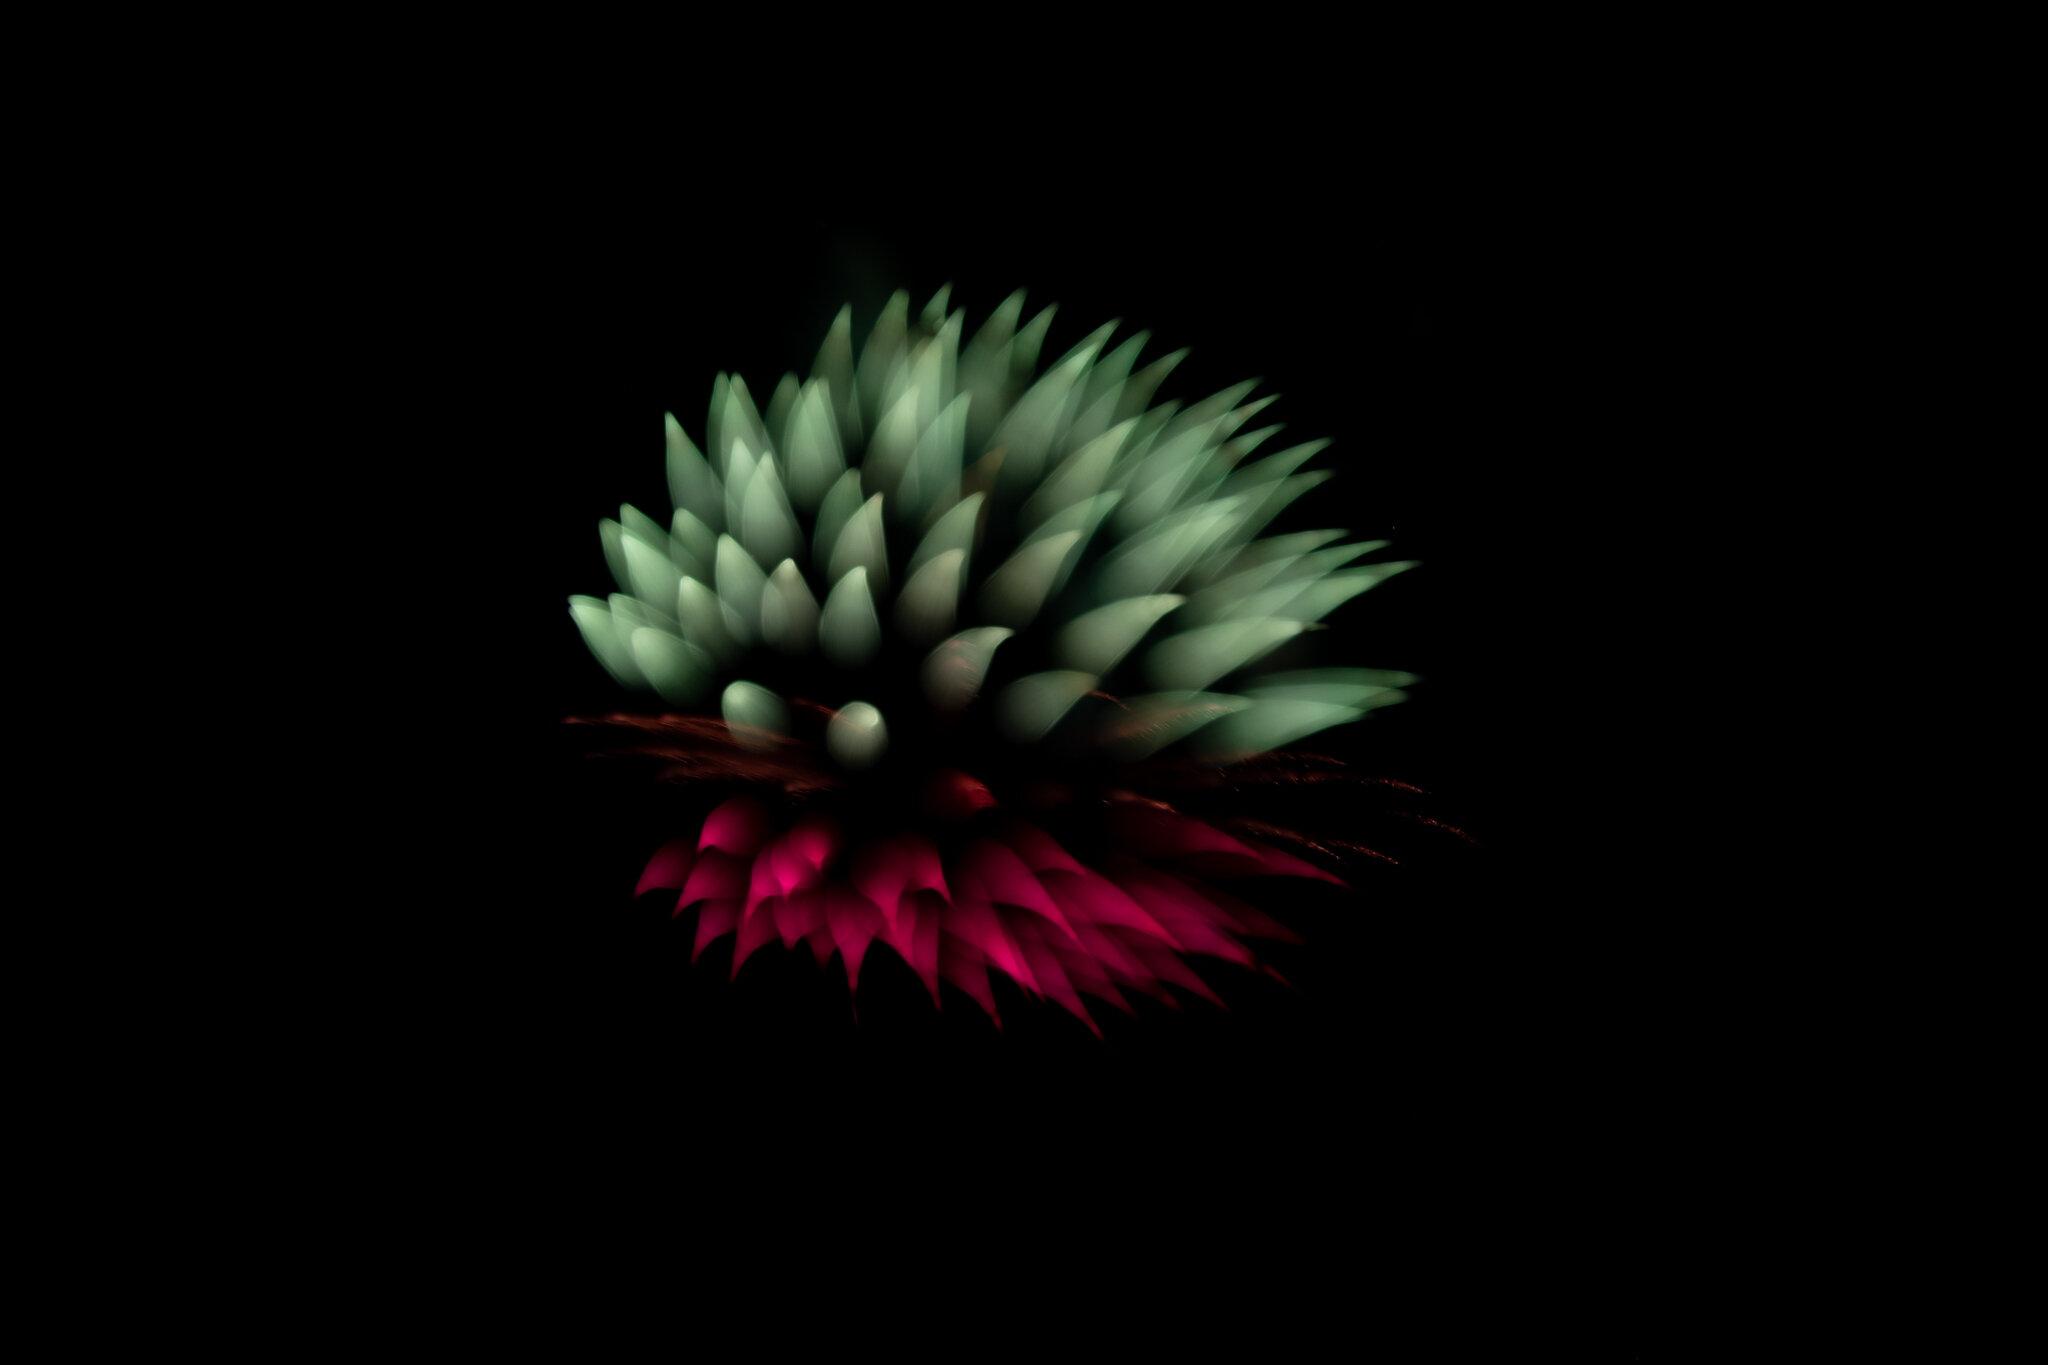 focuspulledfireworks-19.jpg